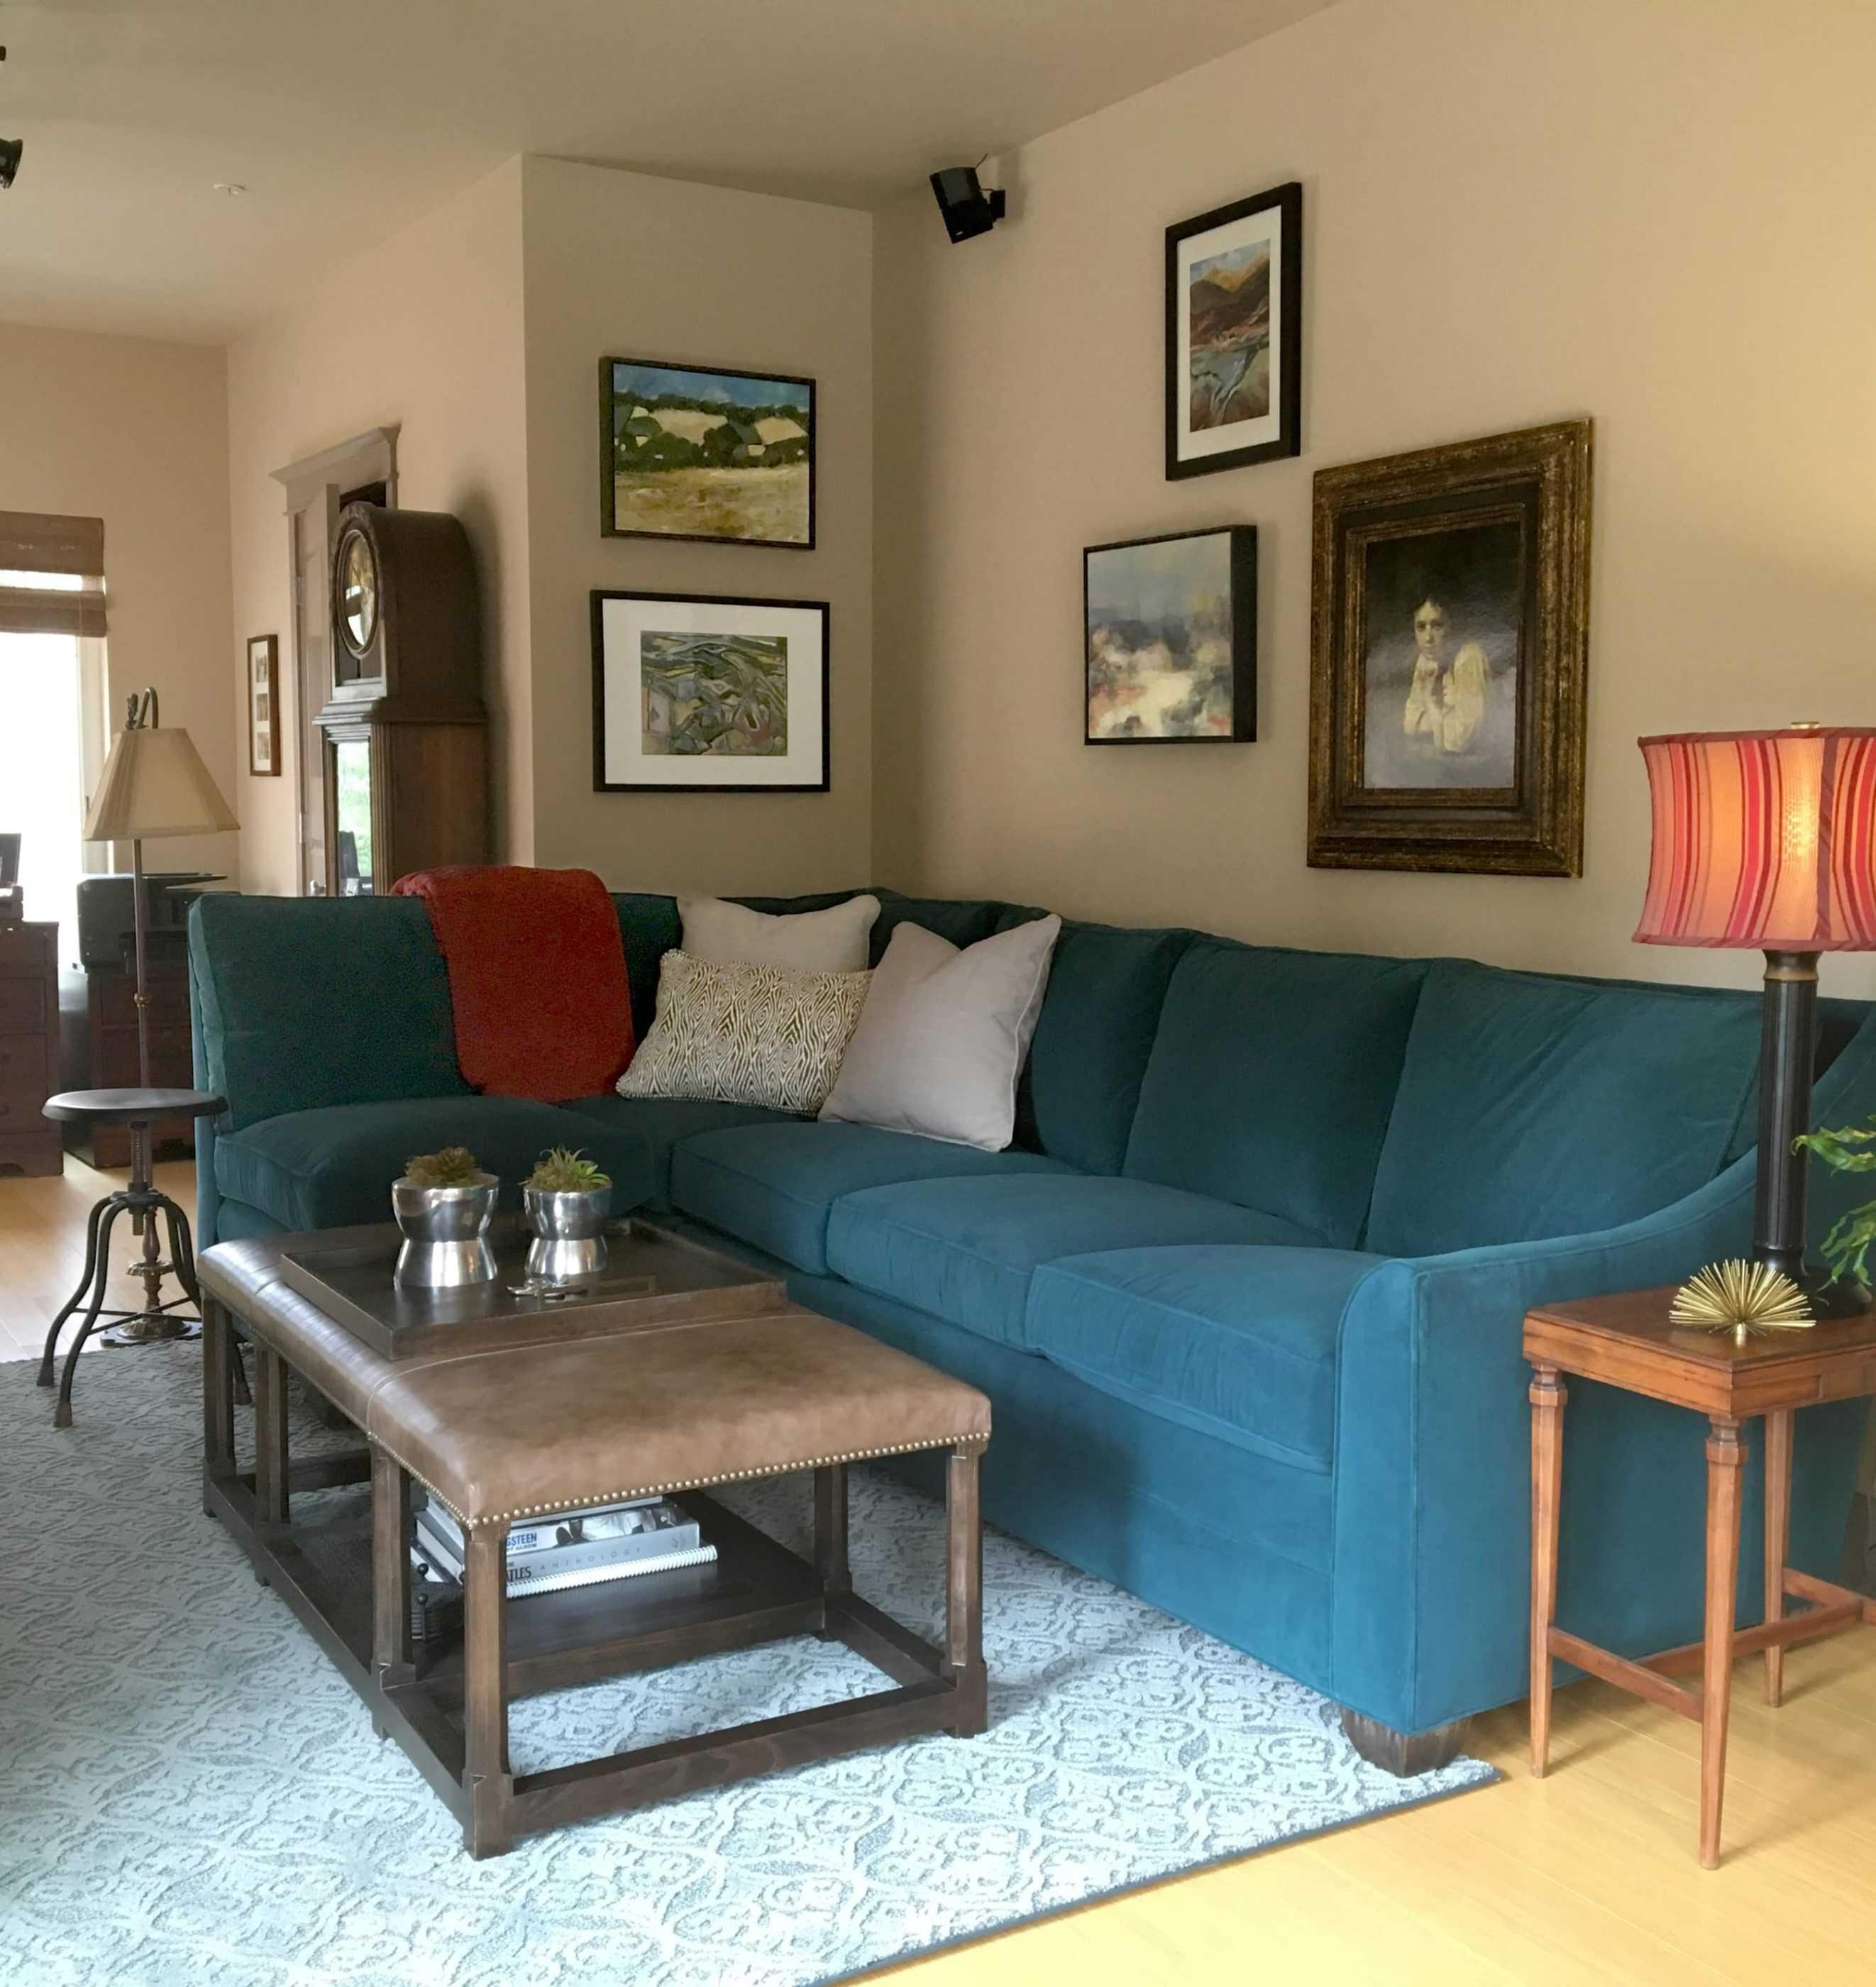 Living Room Design With Blue Velvet Couch